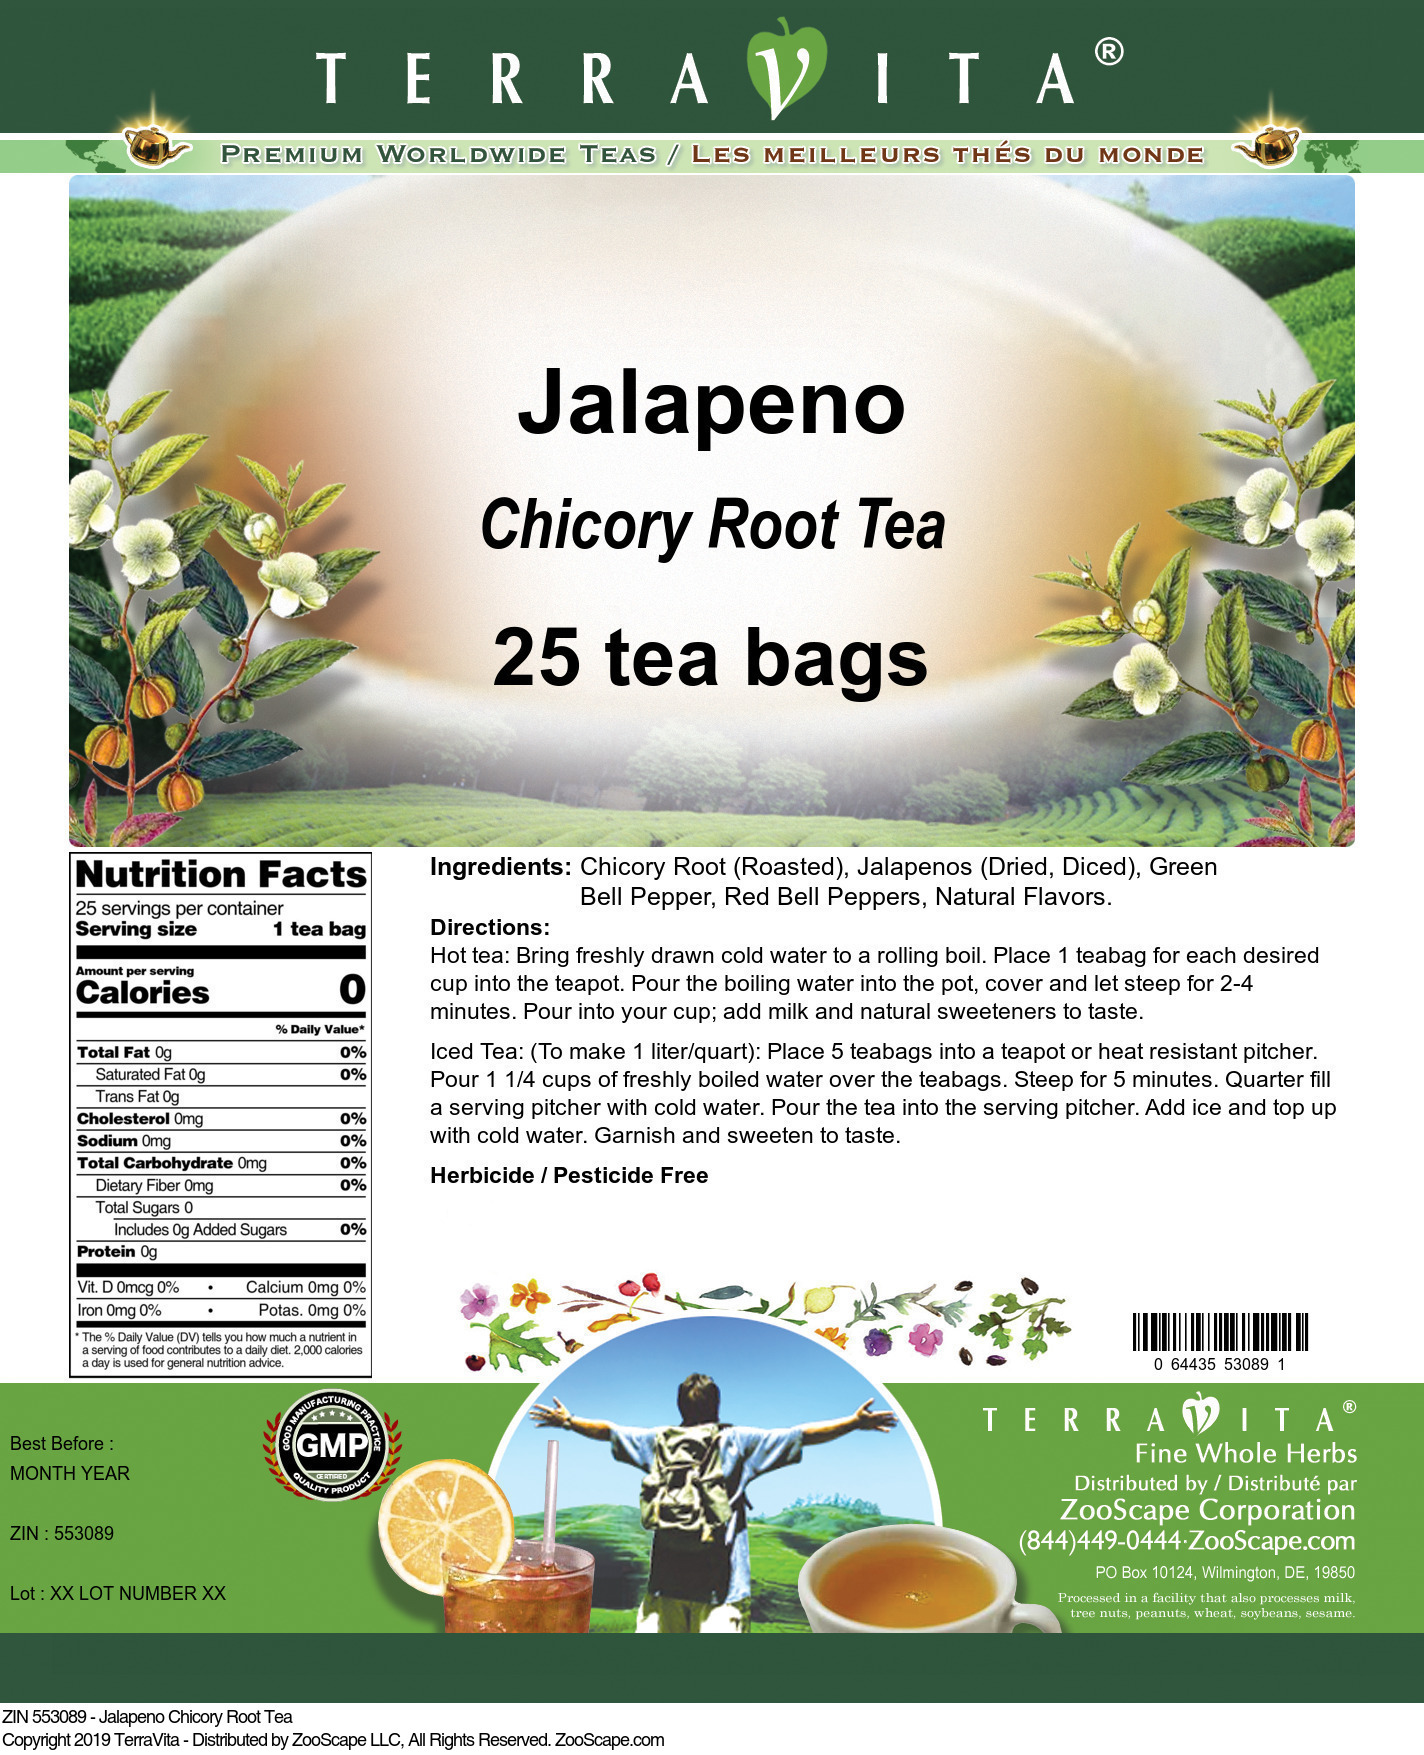 Jalapeno Chicory Root